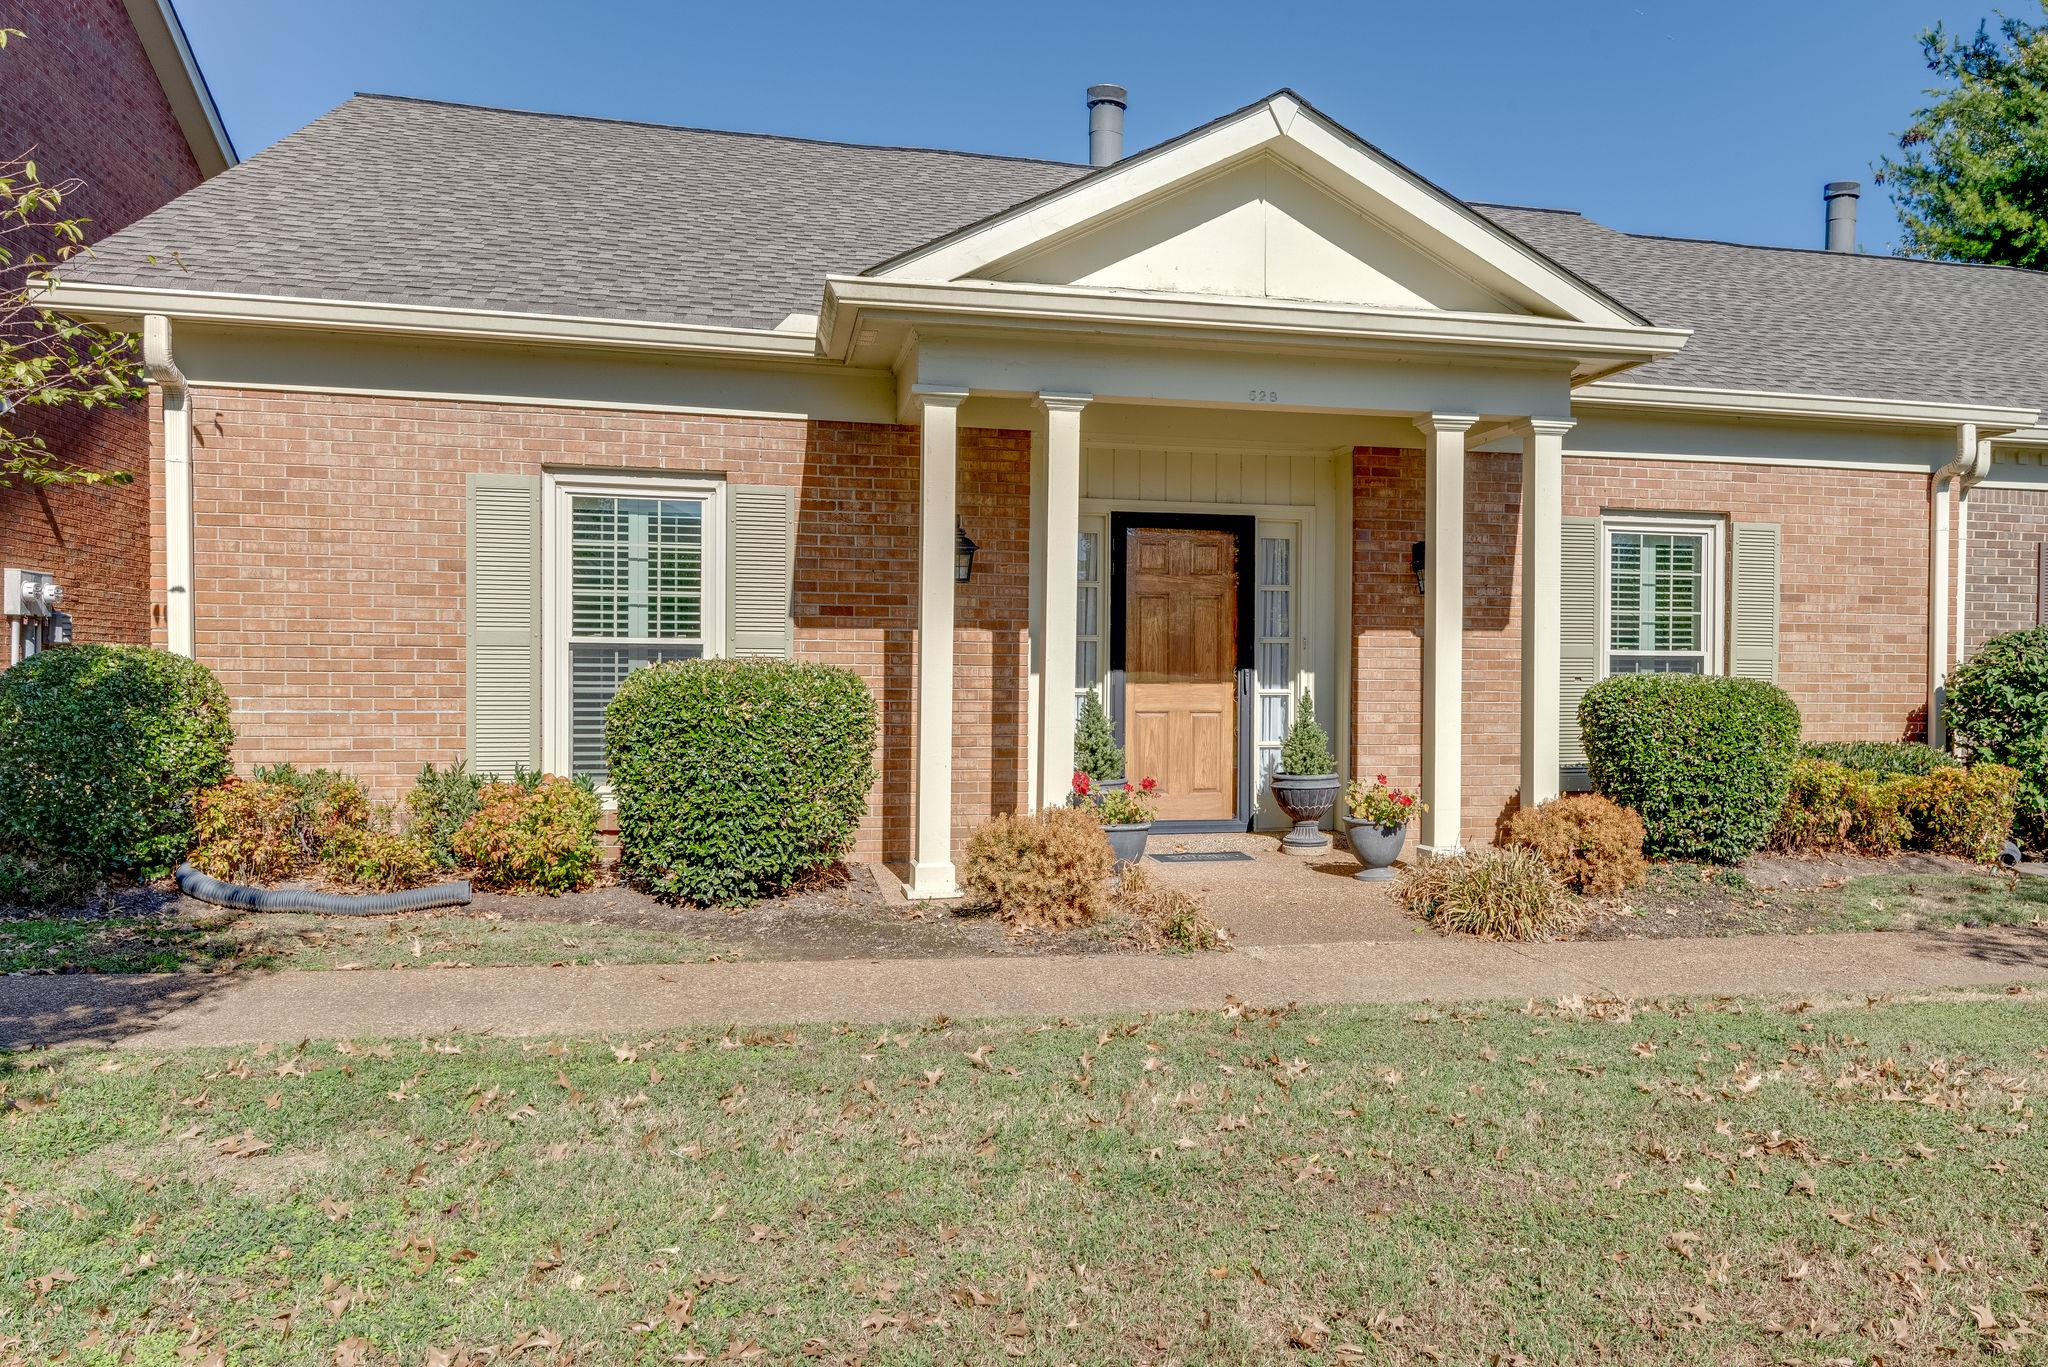 528 General George Patton Rd, Nashville, TN 37221 - Nashville, TN real estate listing